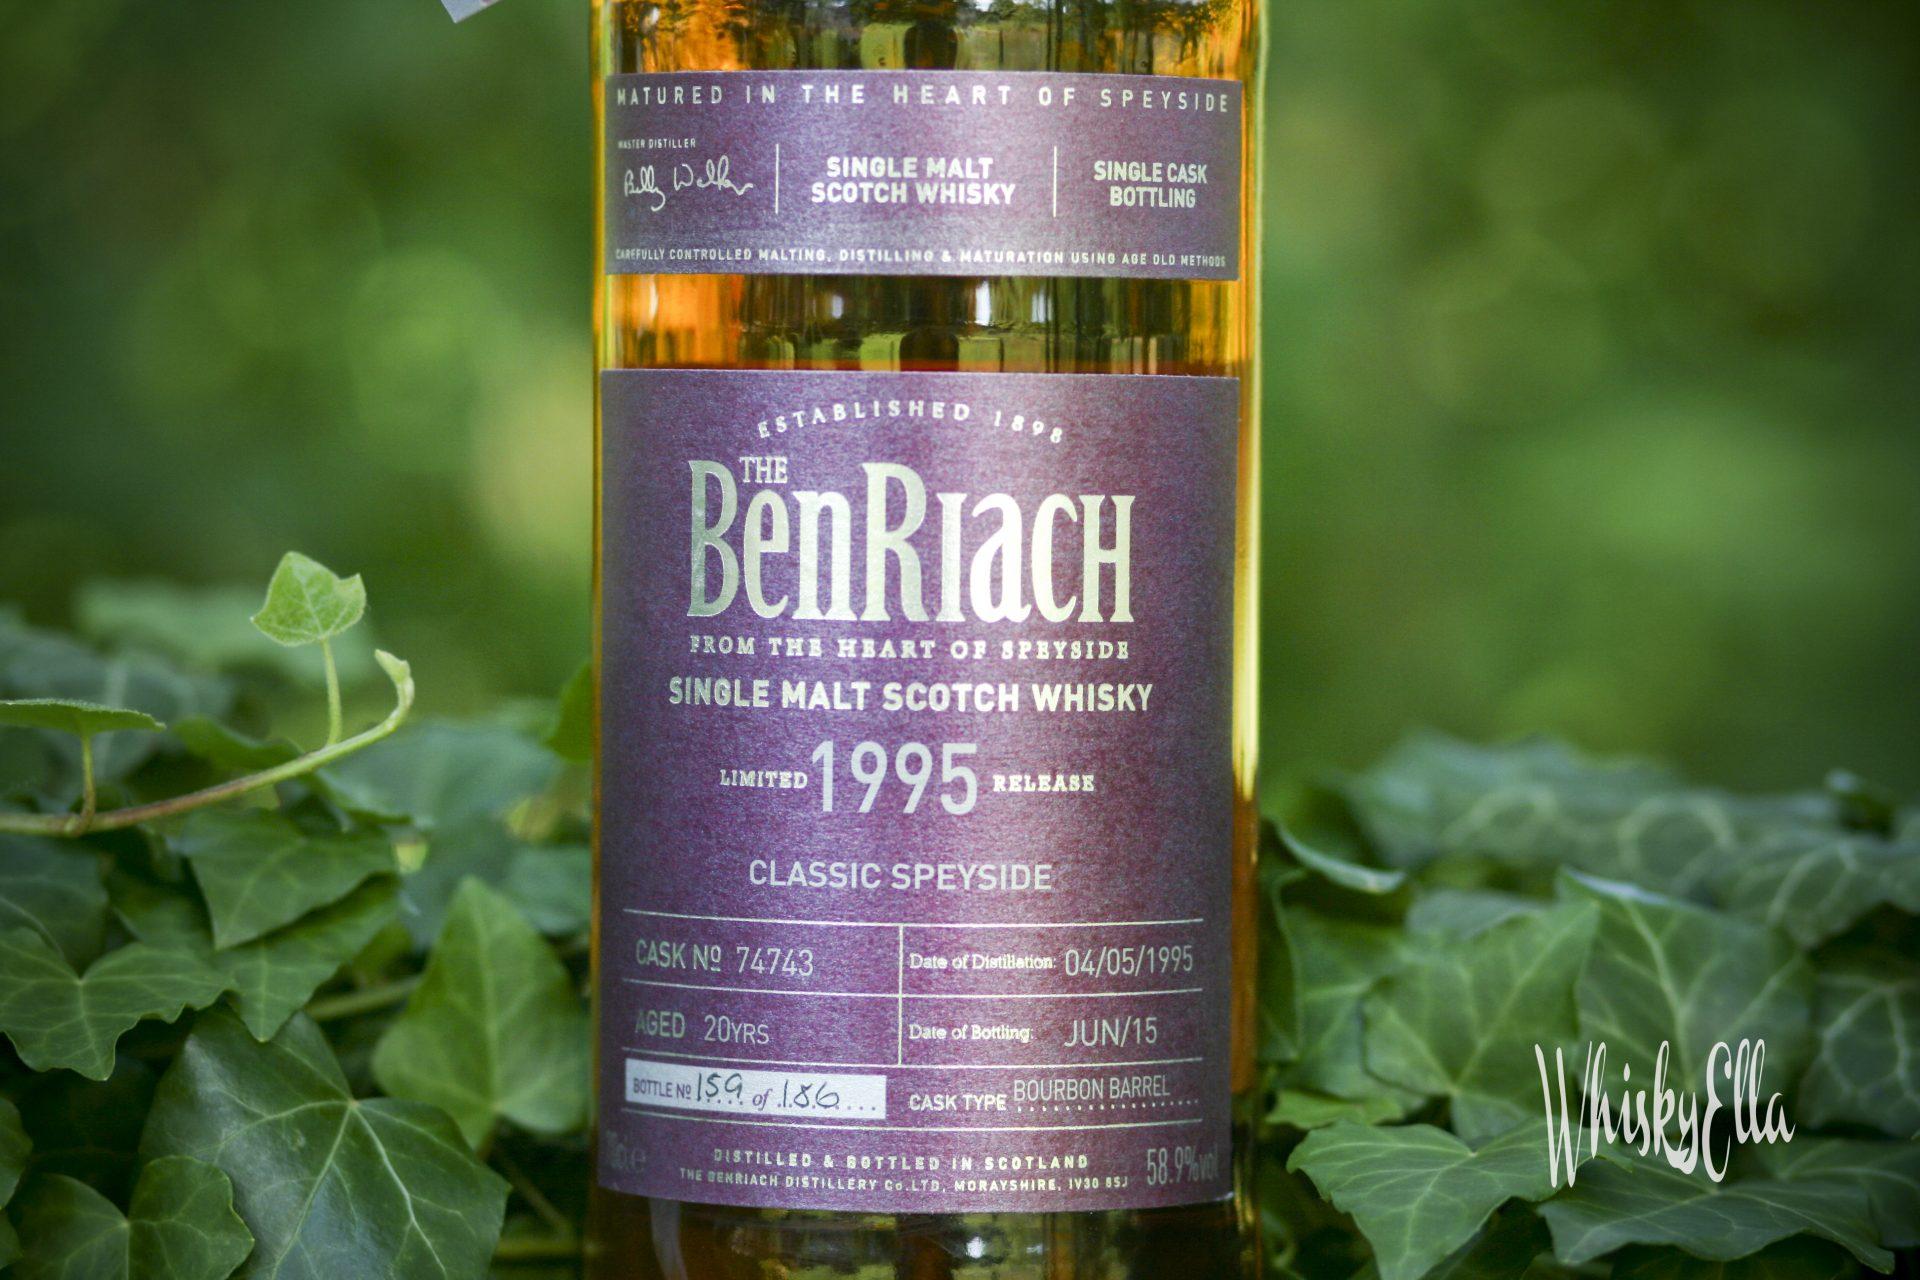 Nasza recenzja BenRiach 1995 20 yo Bourbon Barrel cask 74743 #83